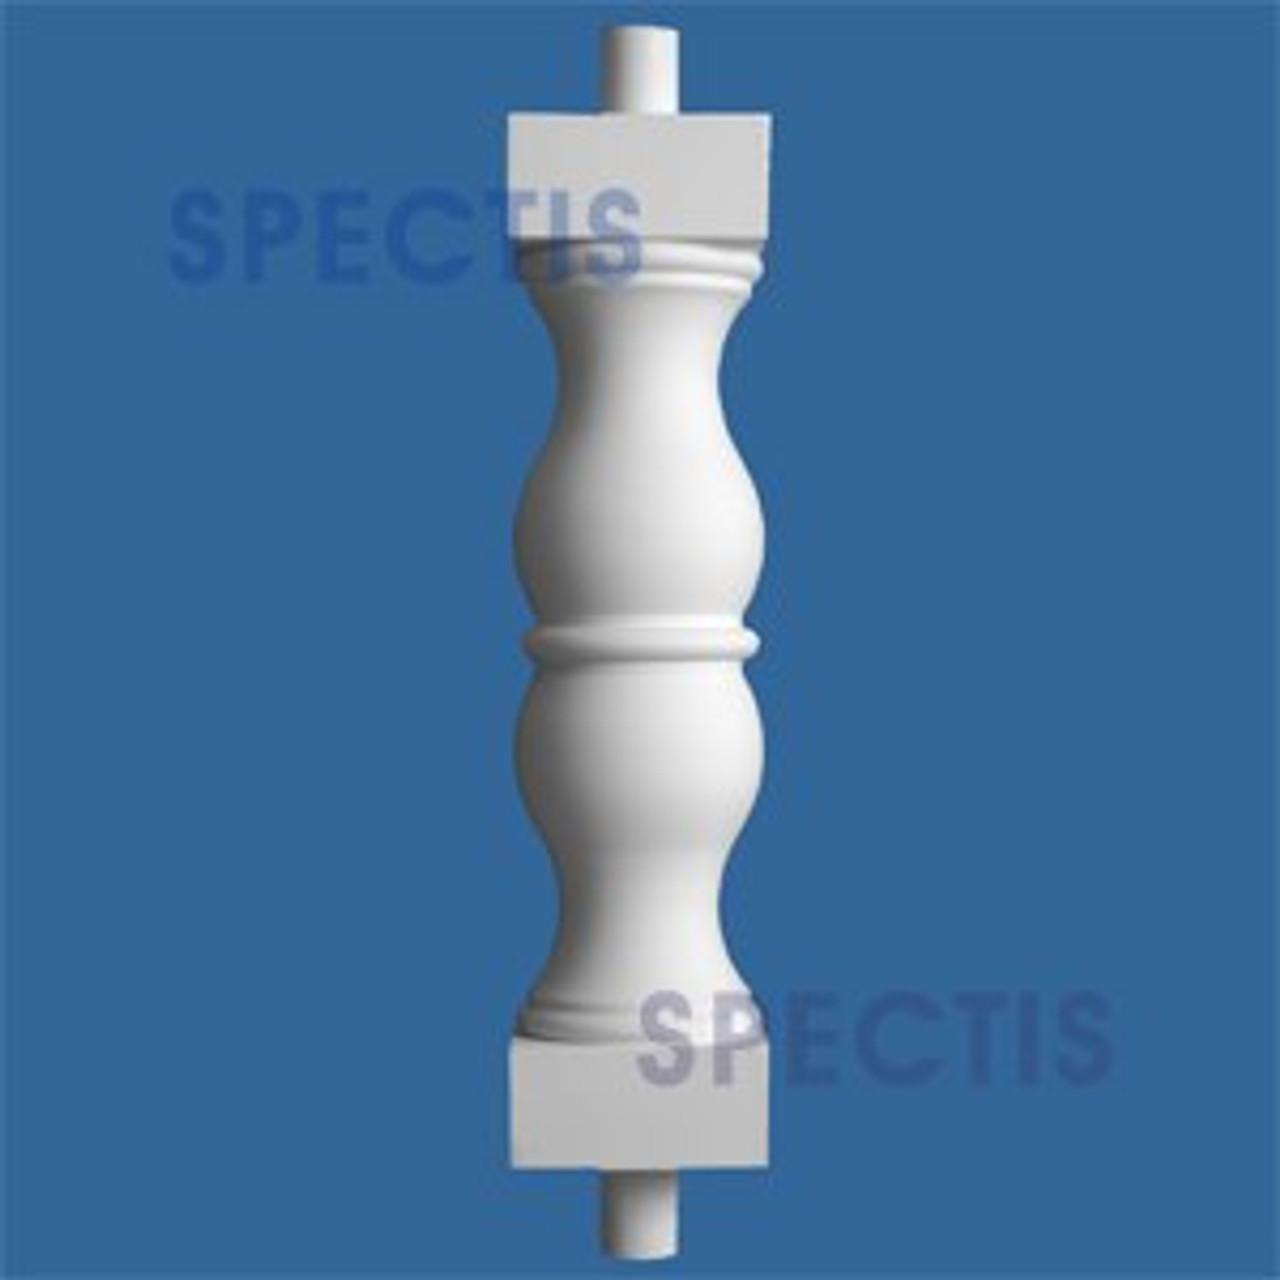 "BAL2210-22 Spectis Urethane Railing Baluster 5 1/2"" x 22"""